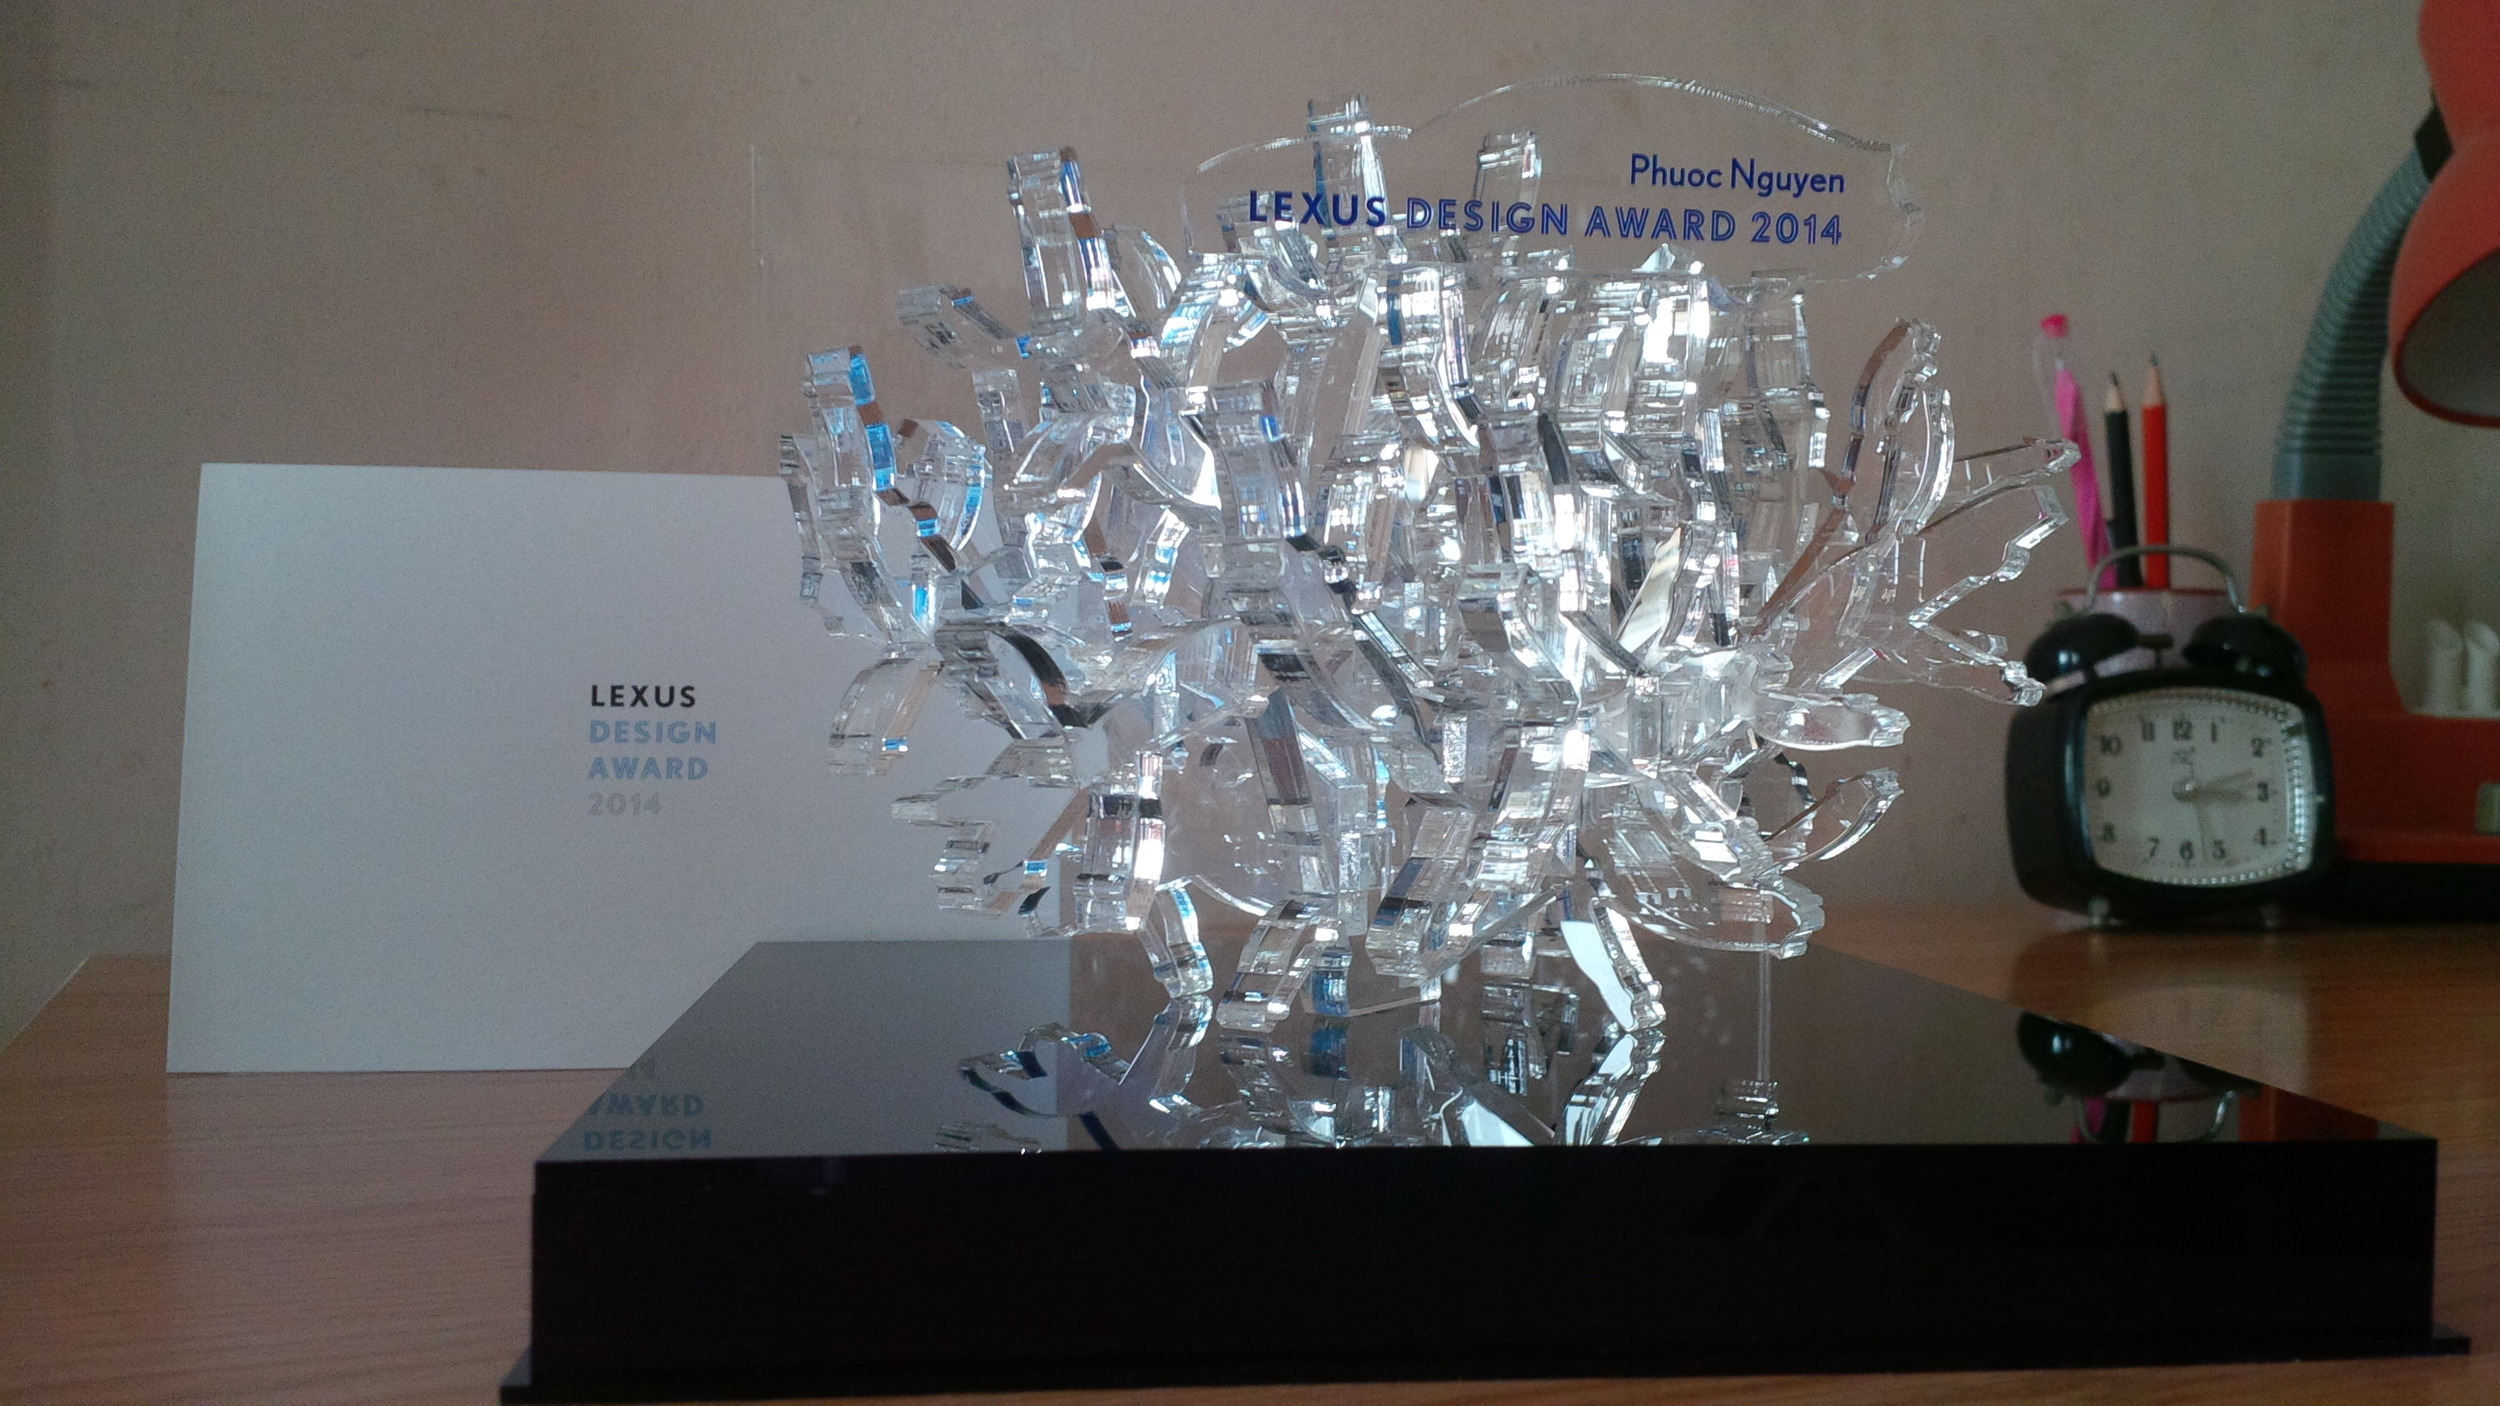 The trophy of Lexus Design Award 2014 (designed by Akihisa Hirata)